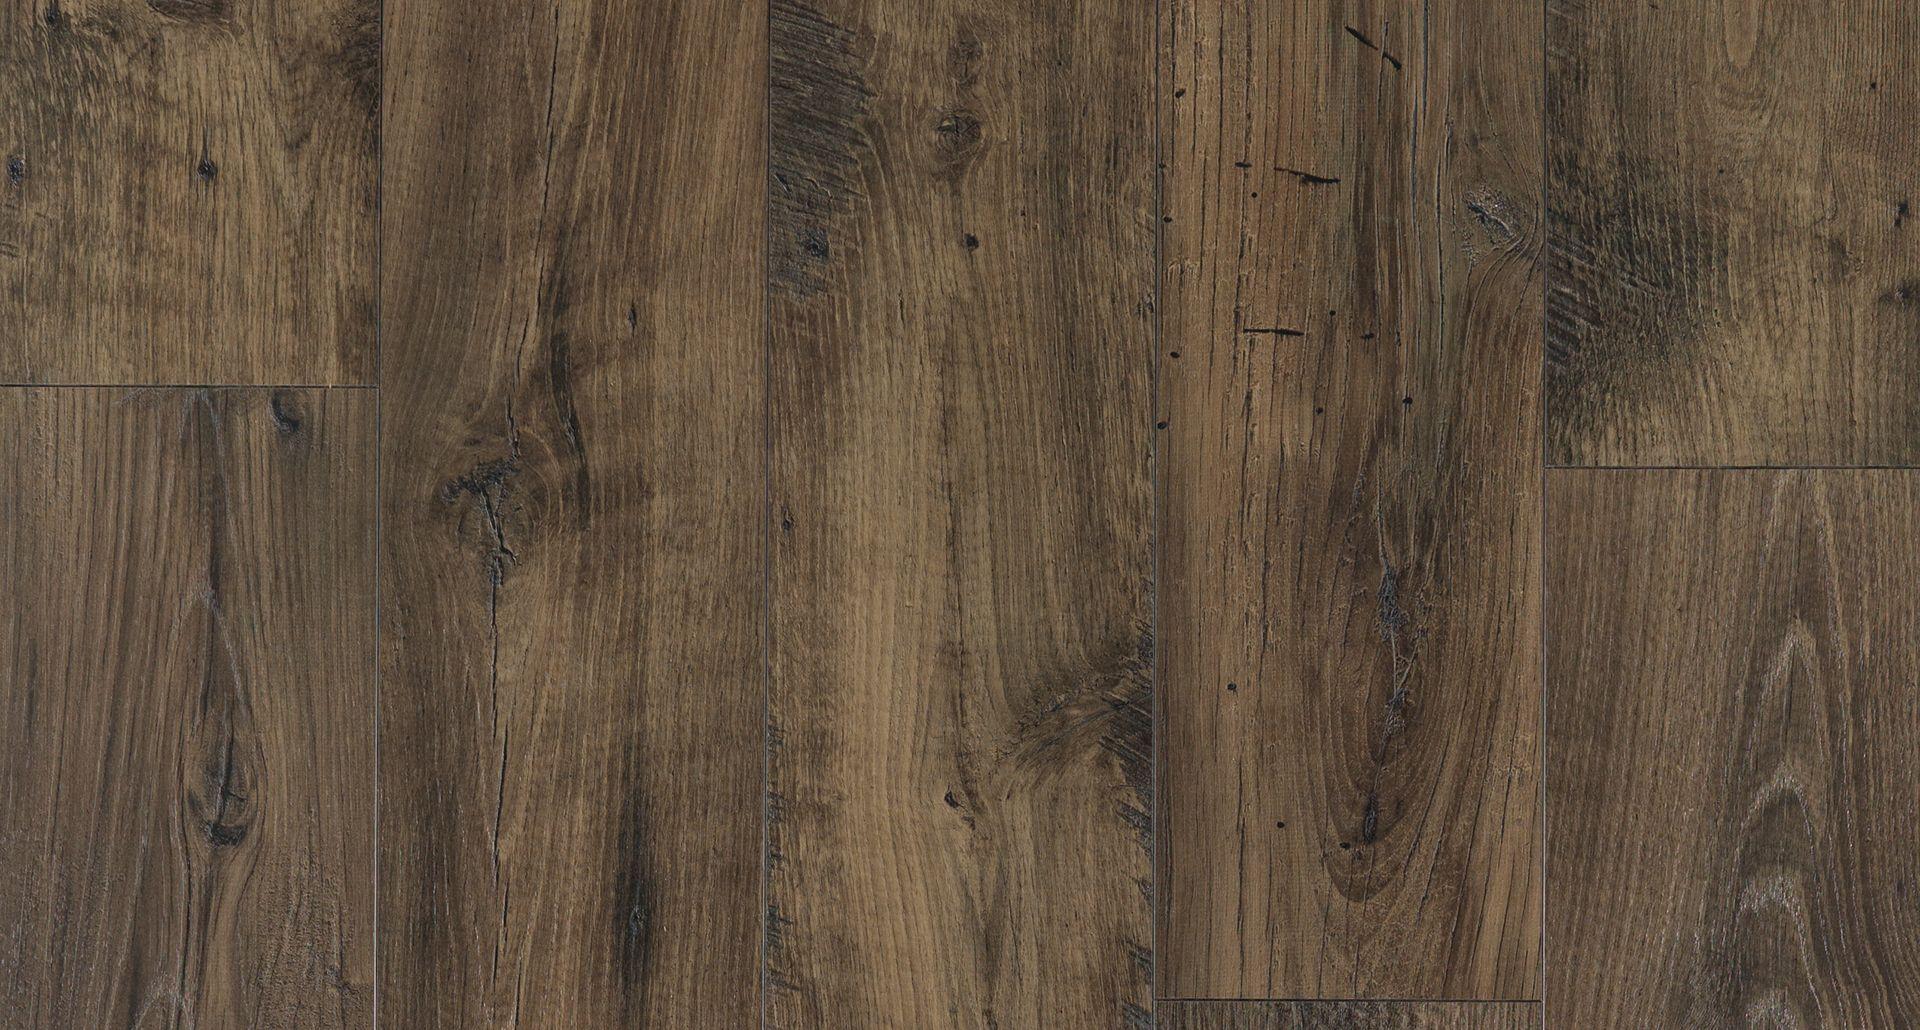 Textured 1 Strip Plank Smoked Chestnut Pergo Max Laminate Flooring Flooring Pergo Flooring Hardwood